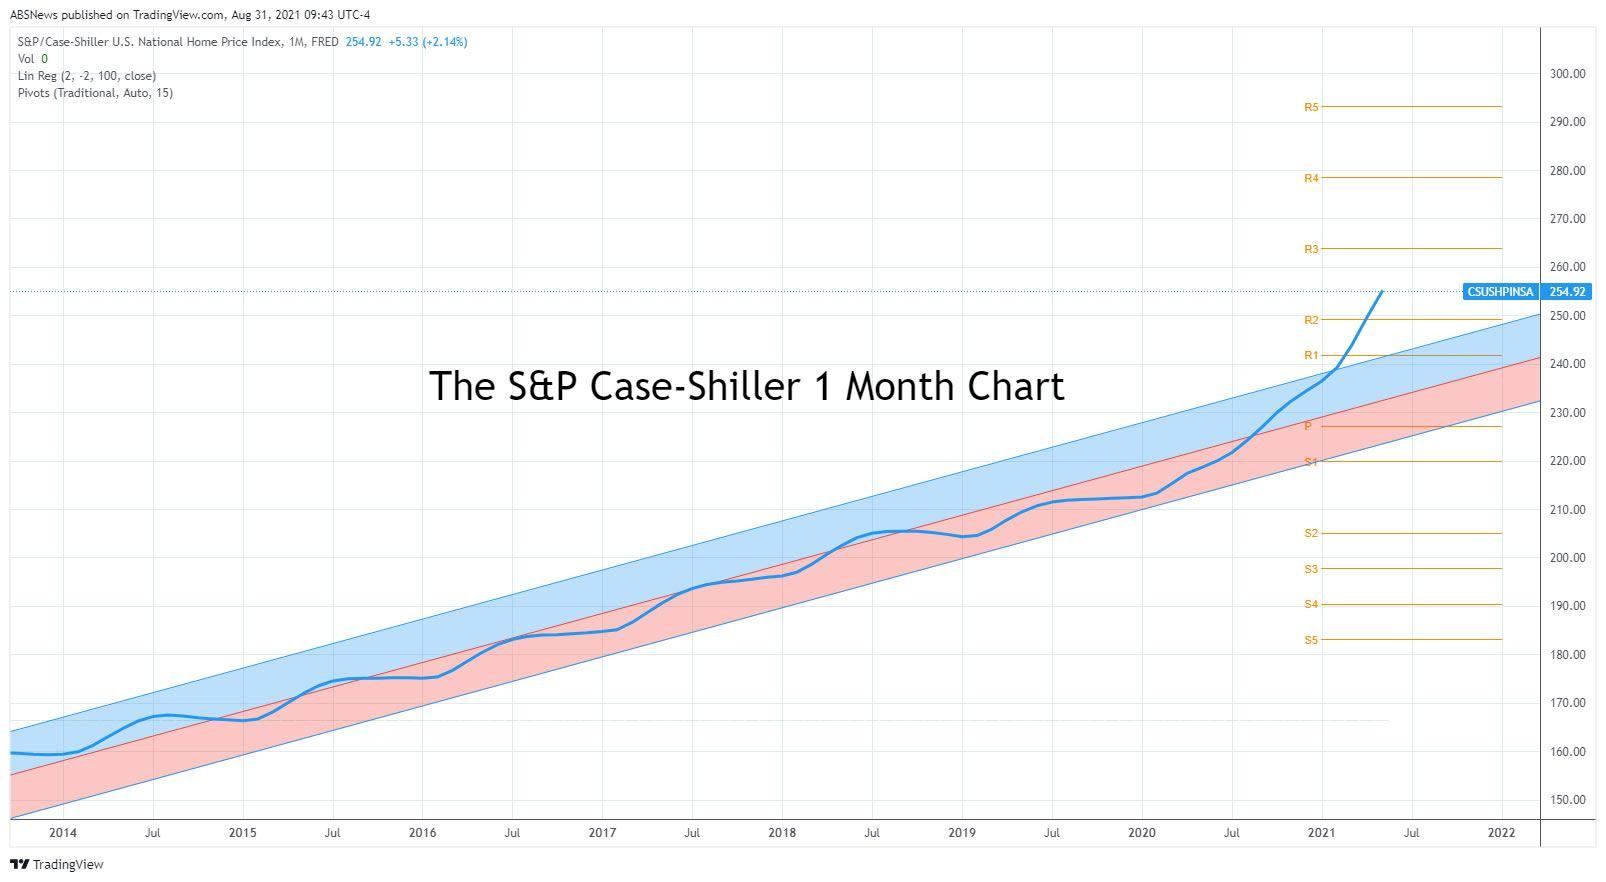 S&P Case-Shiller